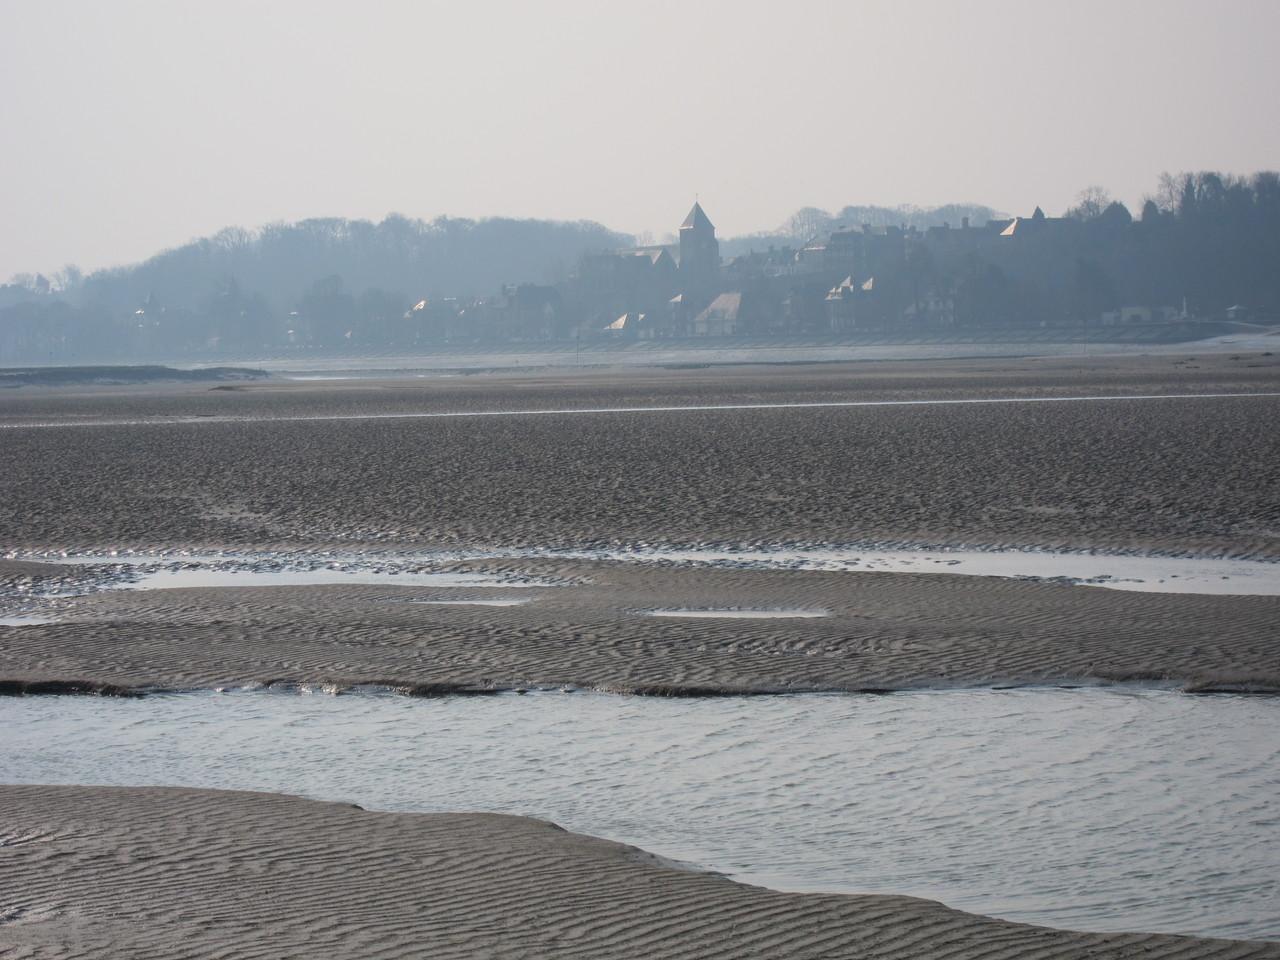 Baie de Somme (Photo Sylvie Cabuy)